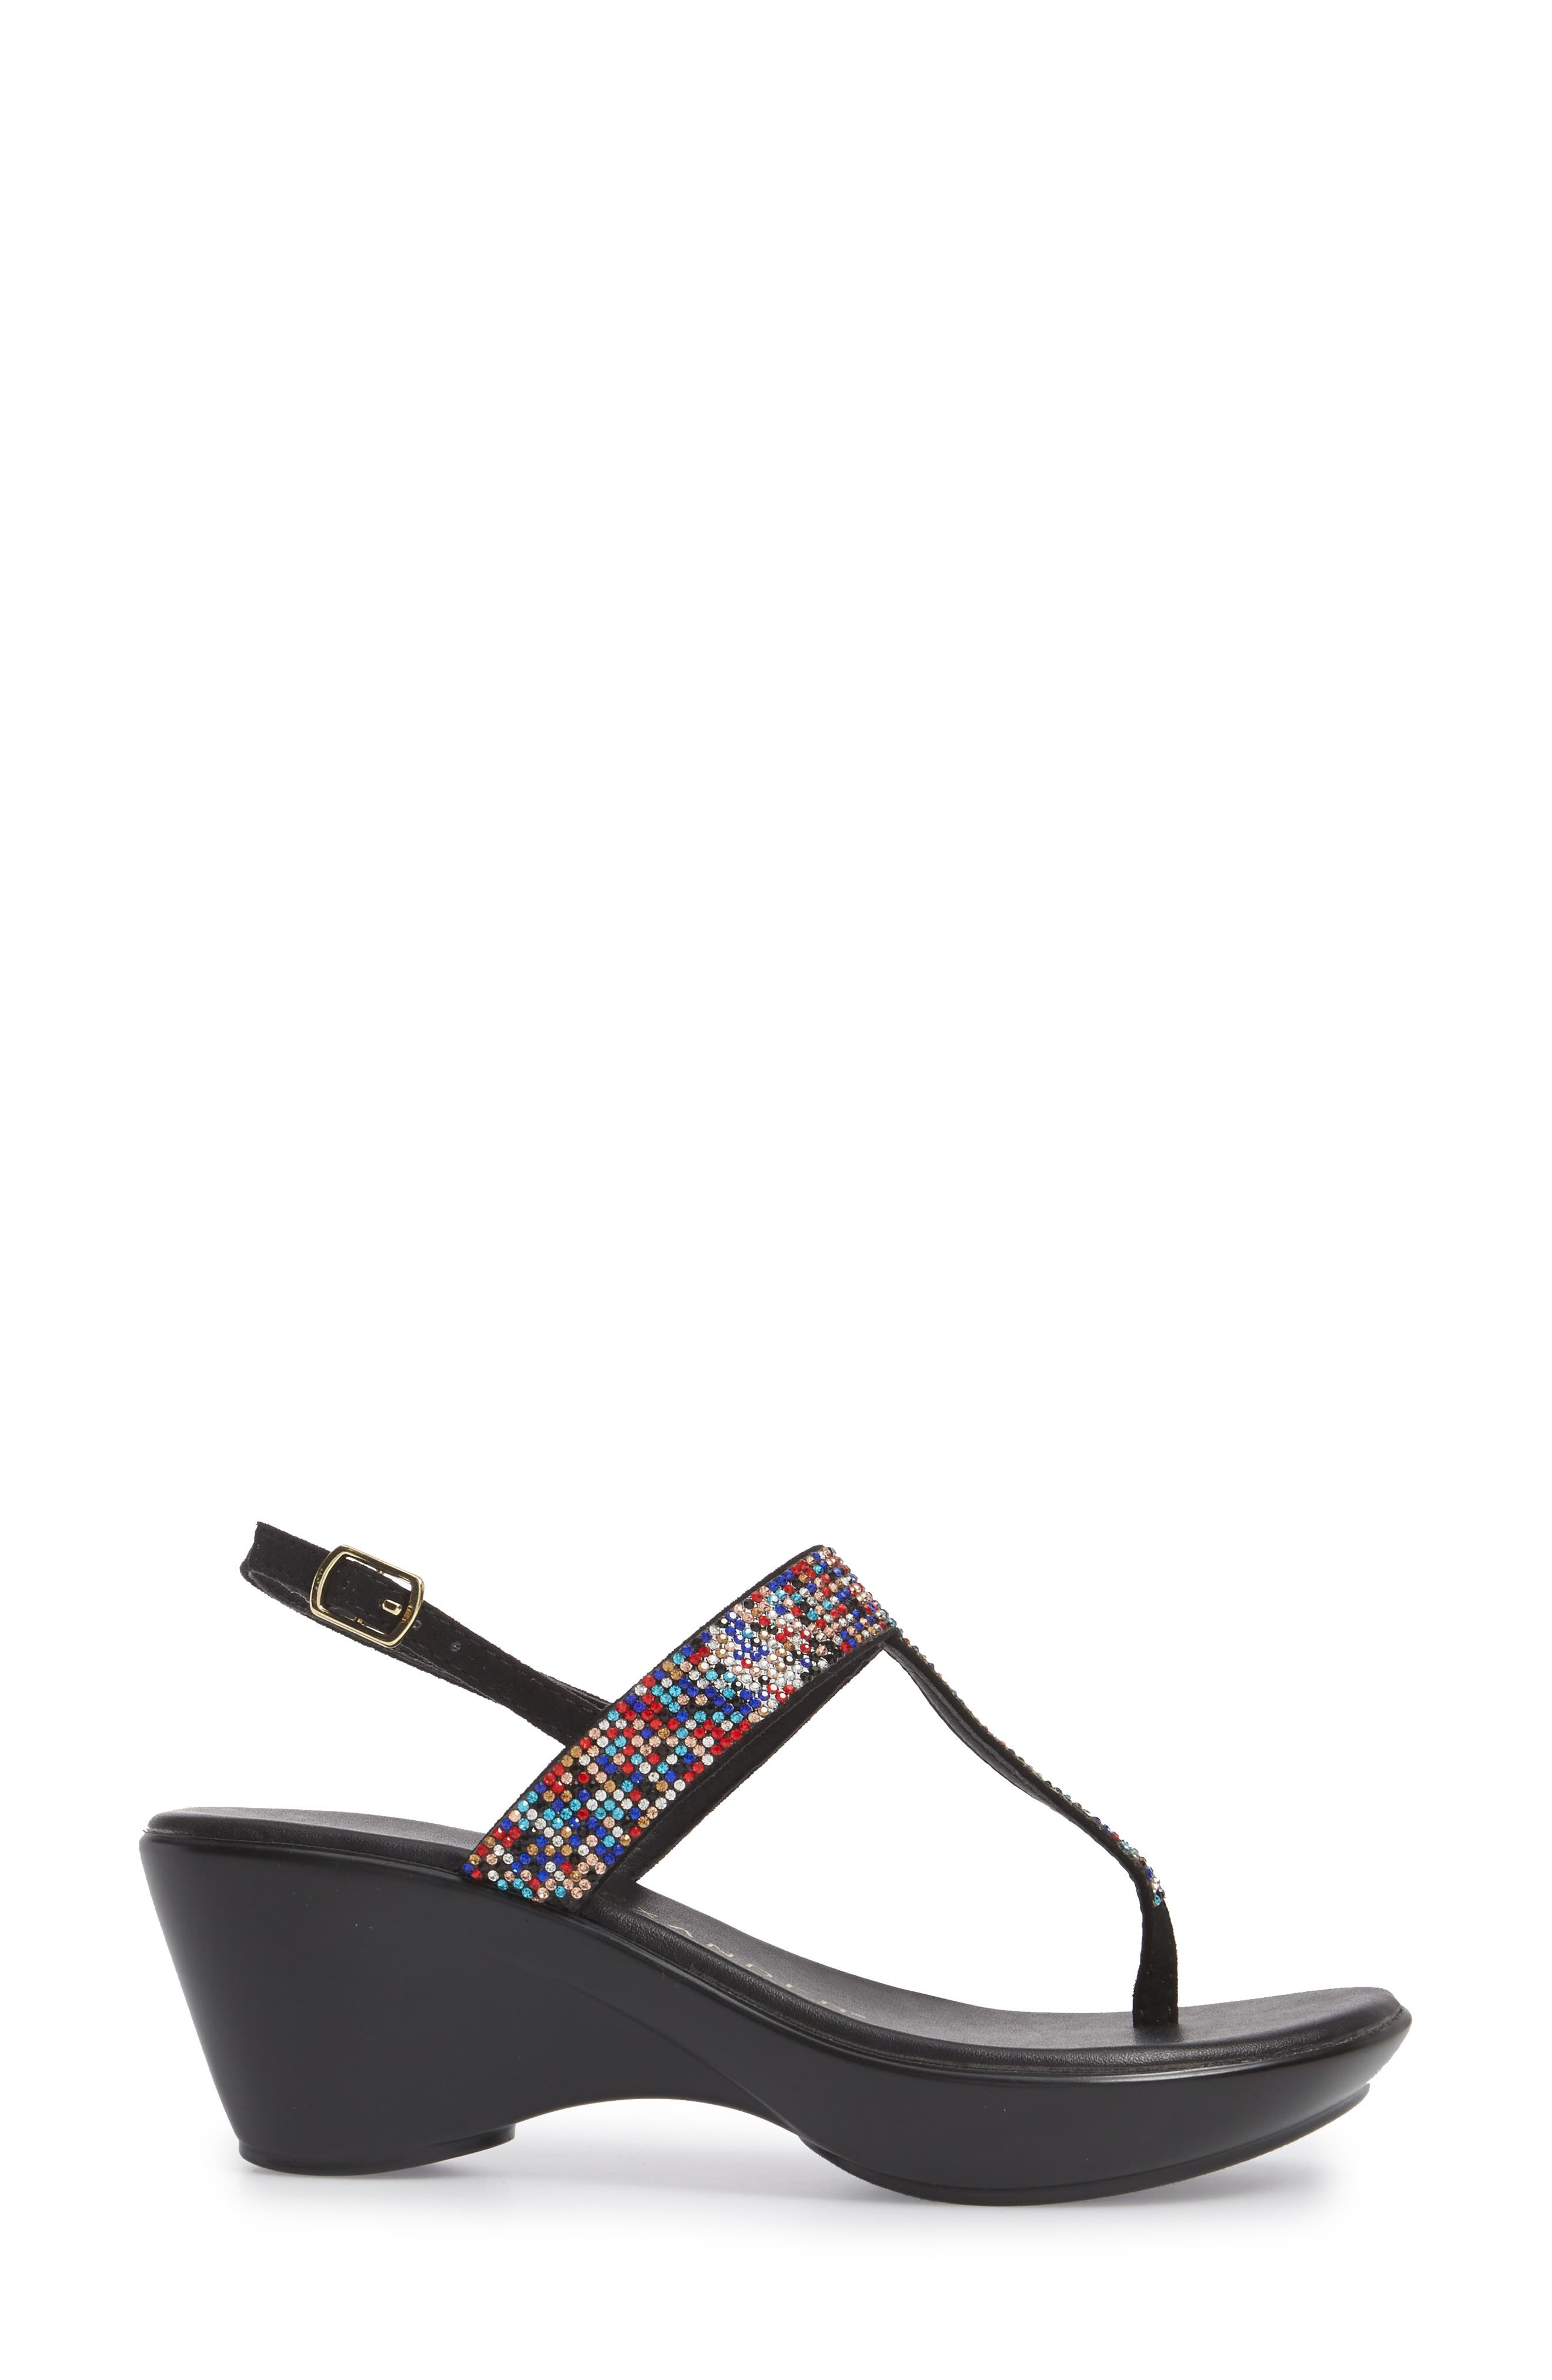 Dakkota Wedge Sandal,                             Alternate thumbnail 3, color,                             001